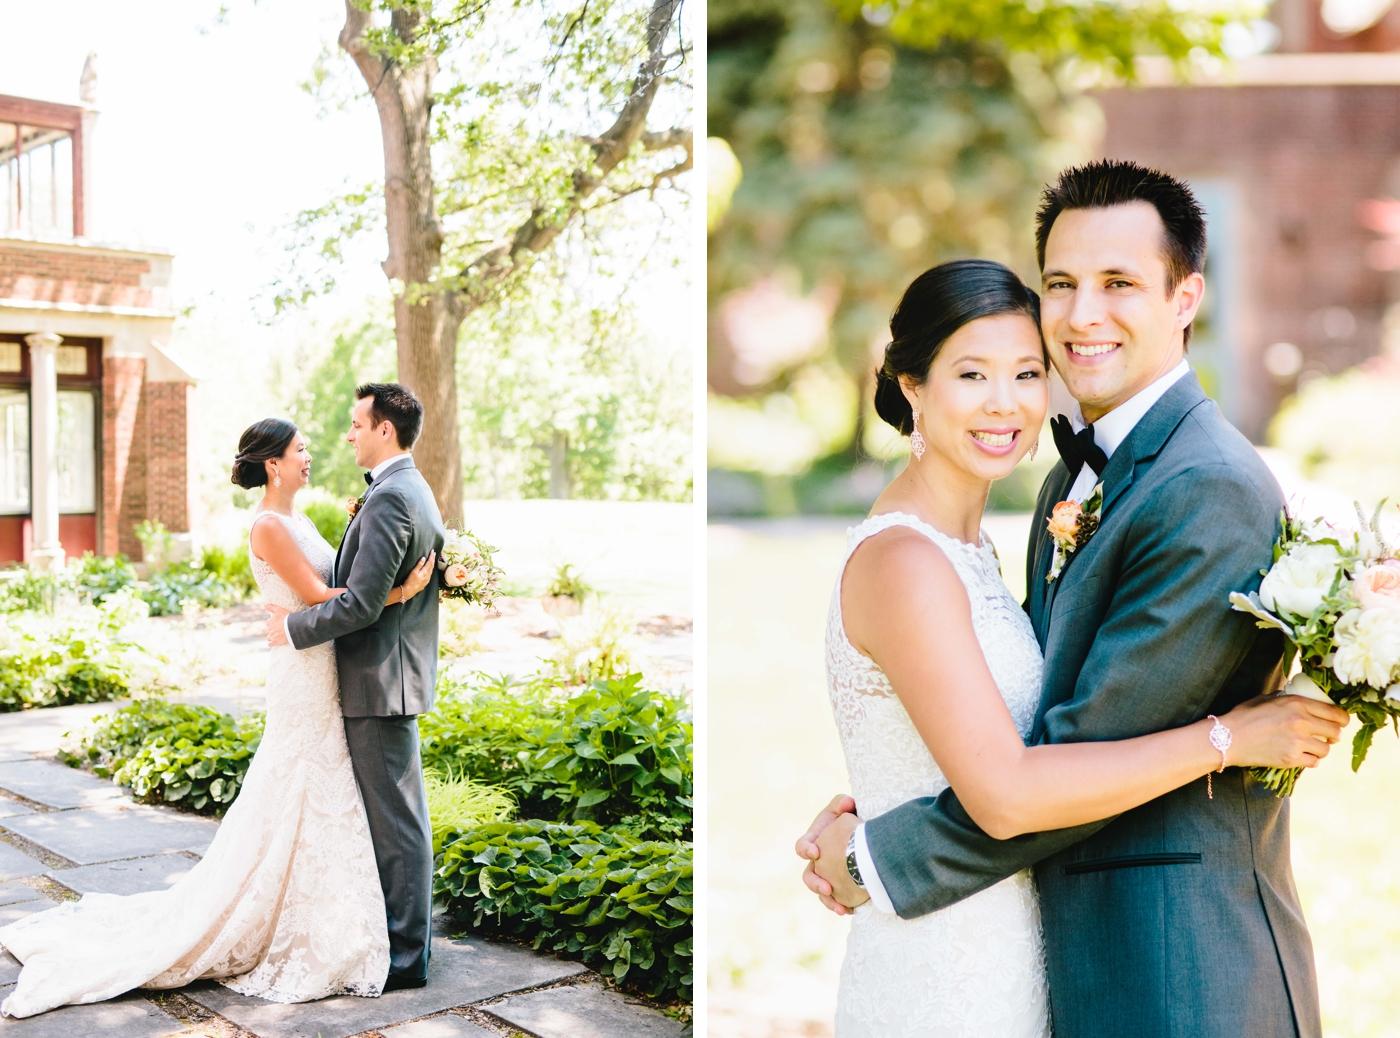 chicago-fine-art-wedding-photography-honey33